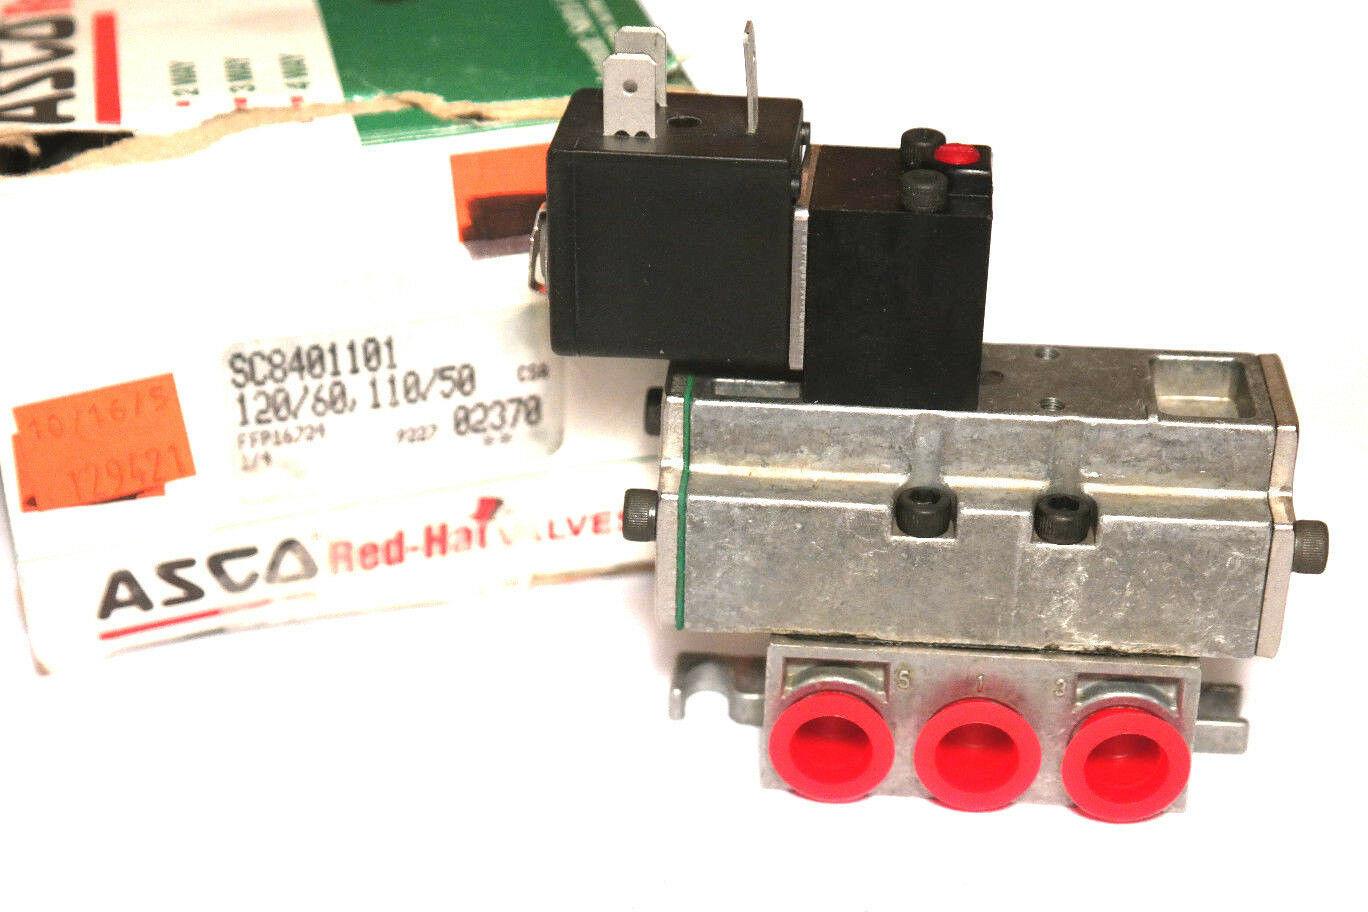 NEW ASCO SC8401101 PNEUMATIC VALVE ASSEMBLY 110/120V, 50/60HZ - $135.00